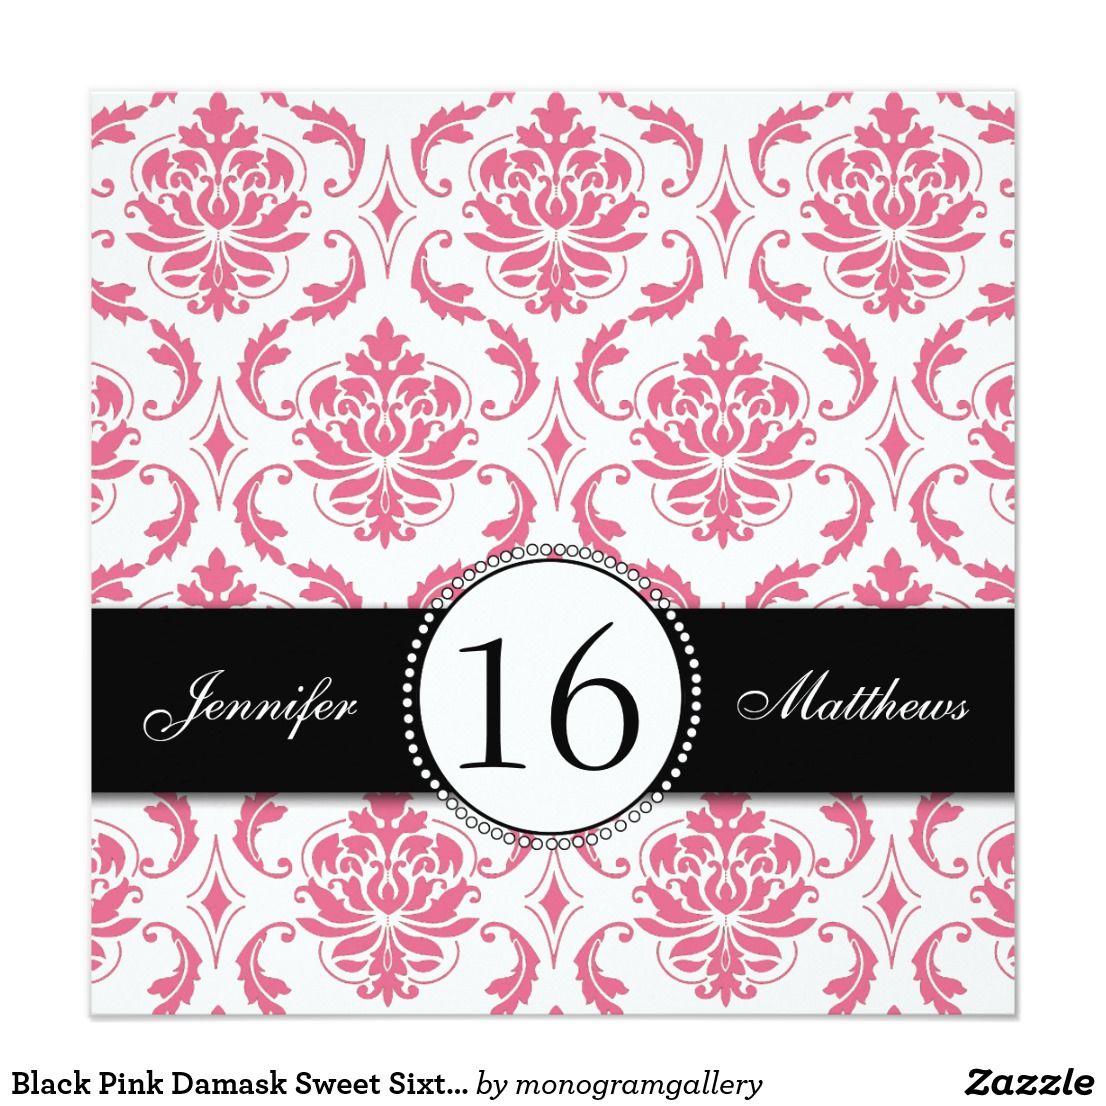 Black Pink Damask Sweet Sixteen Invitations | Sixteenth birthday ...